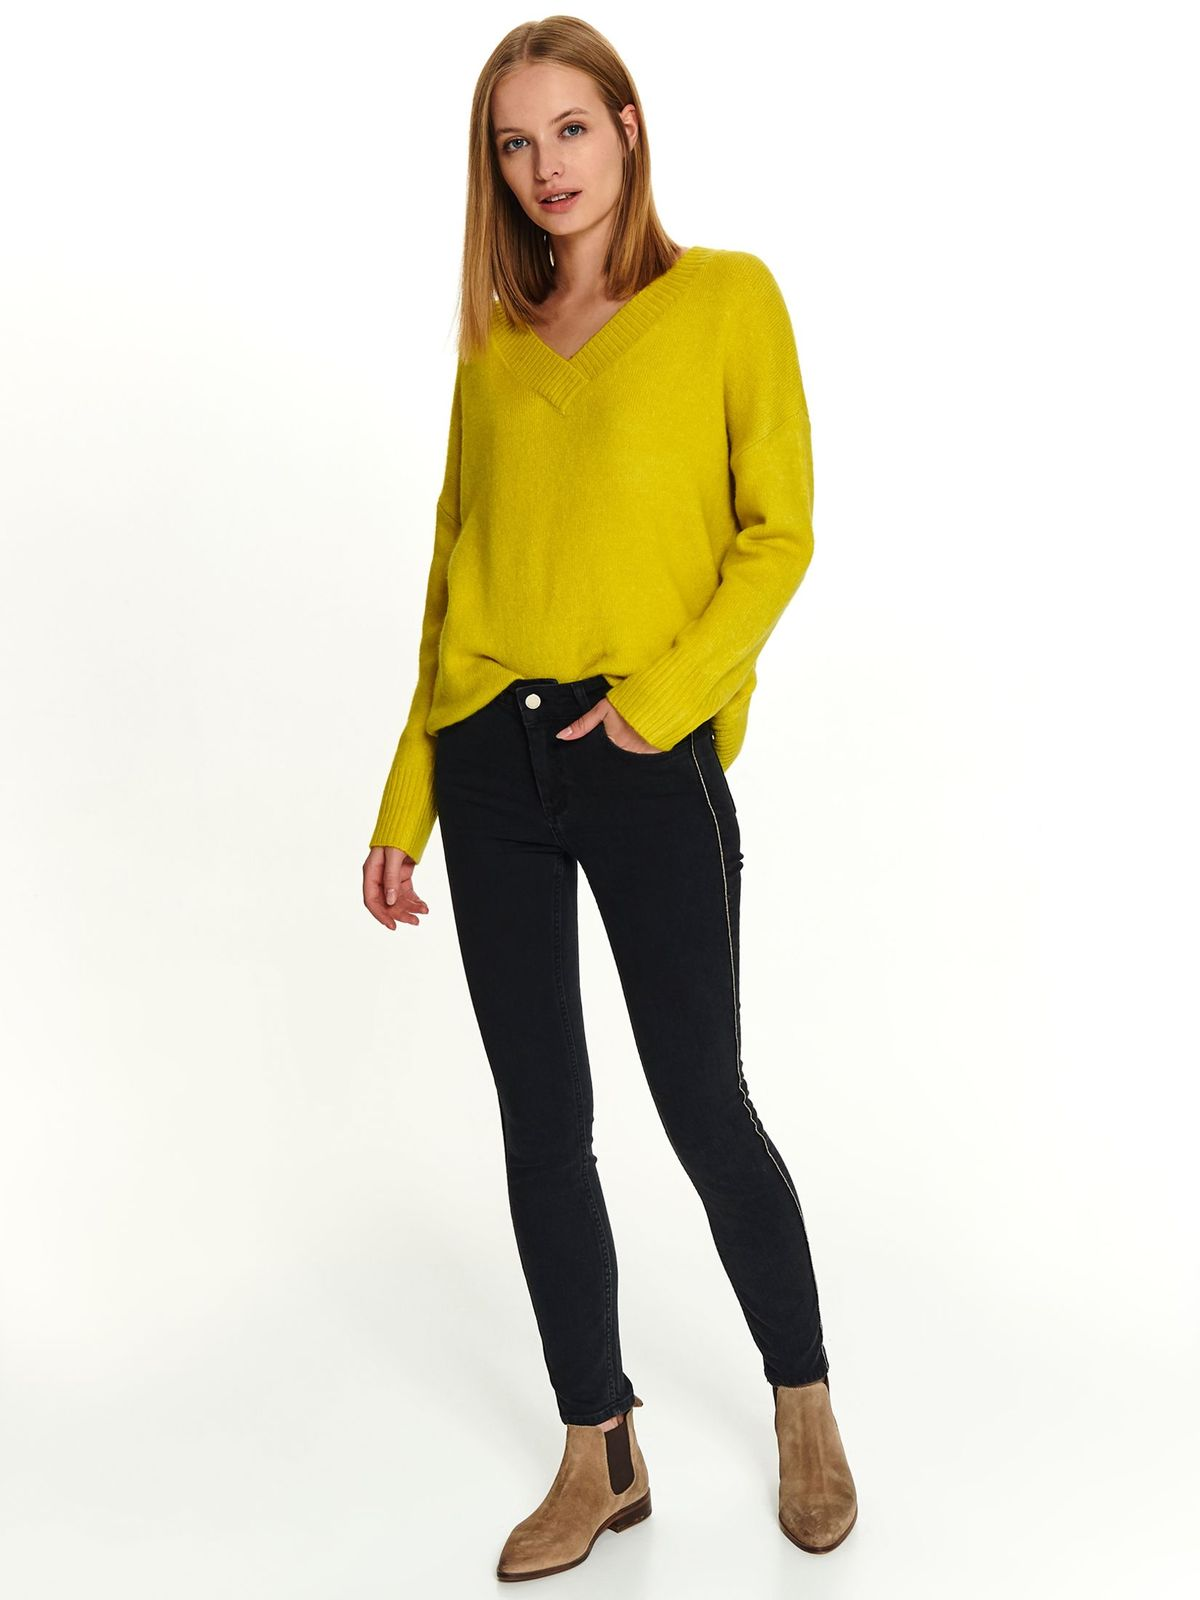 Black casual trousers medium waist slightly elastic cotton